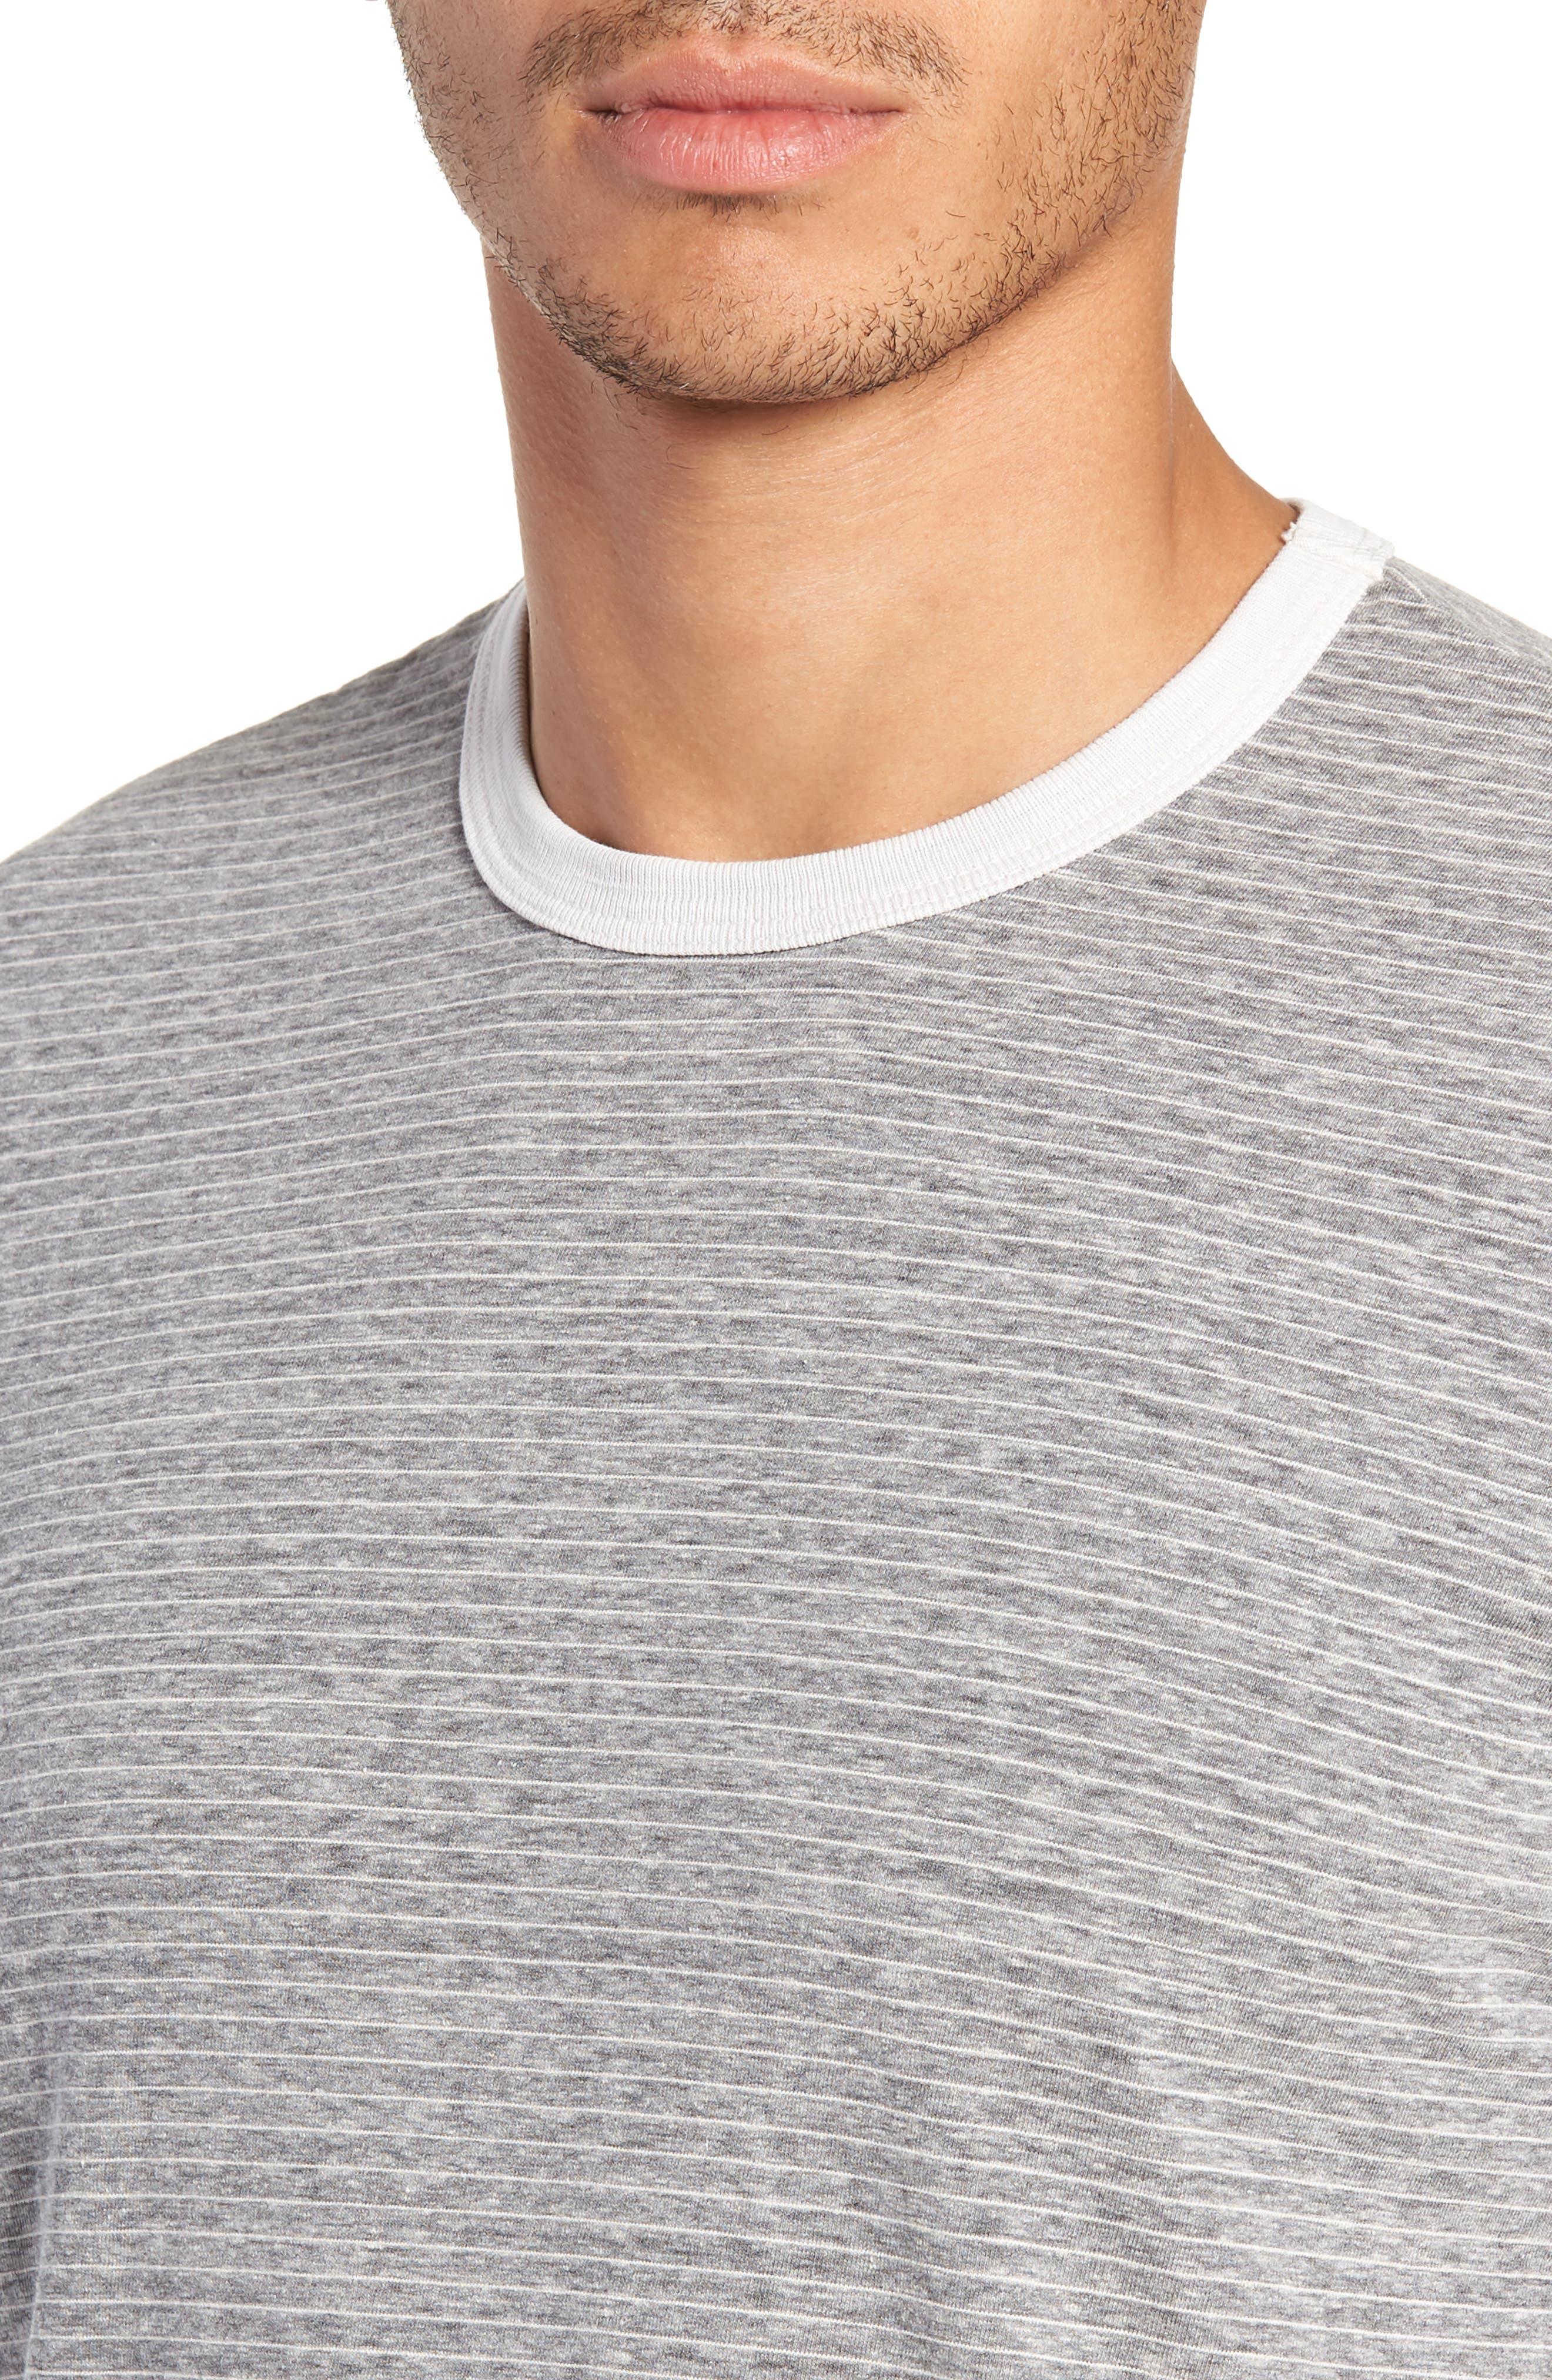 Microstripe Ringer T-Shirt,                             Alternate thumbnail 4, color,                             MEMORY PIGMENT